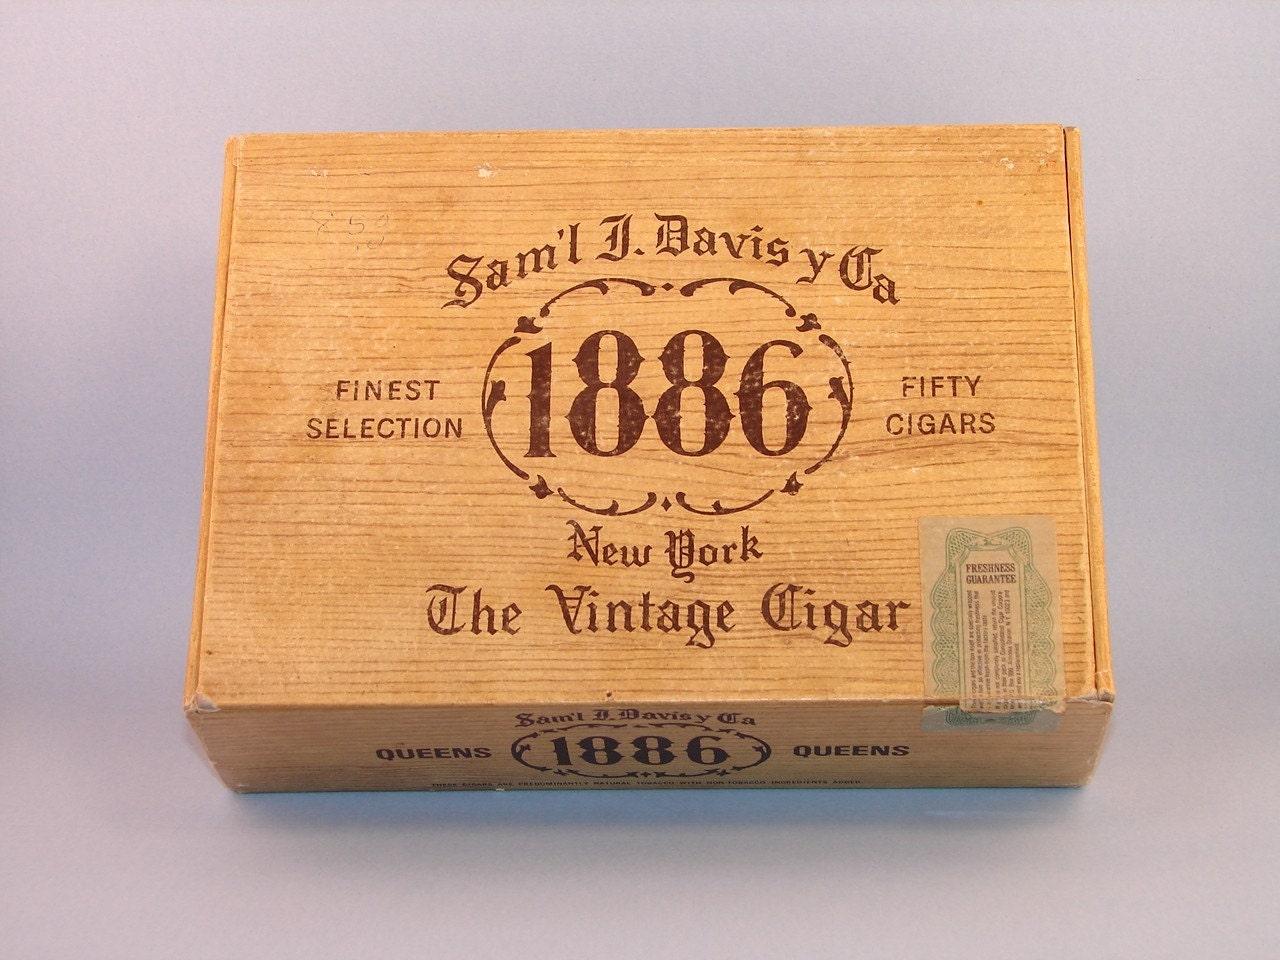 Vintage Samuel J Davis Y Ca Cardboard Cigar Box By